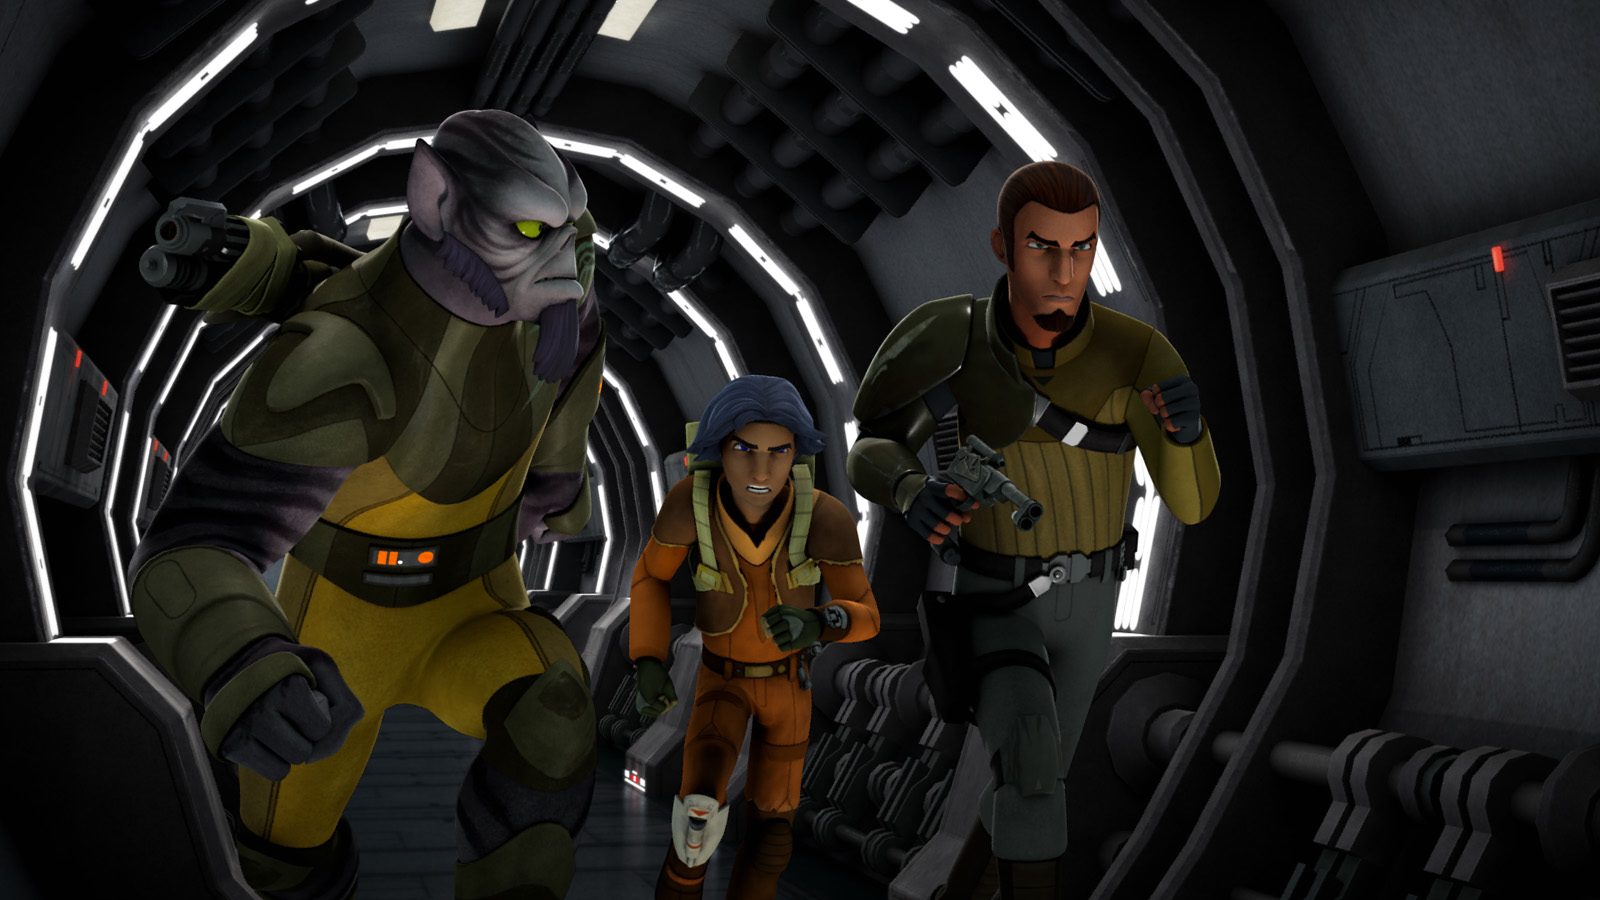 torrent star wars rebels season 1